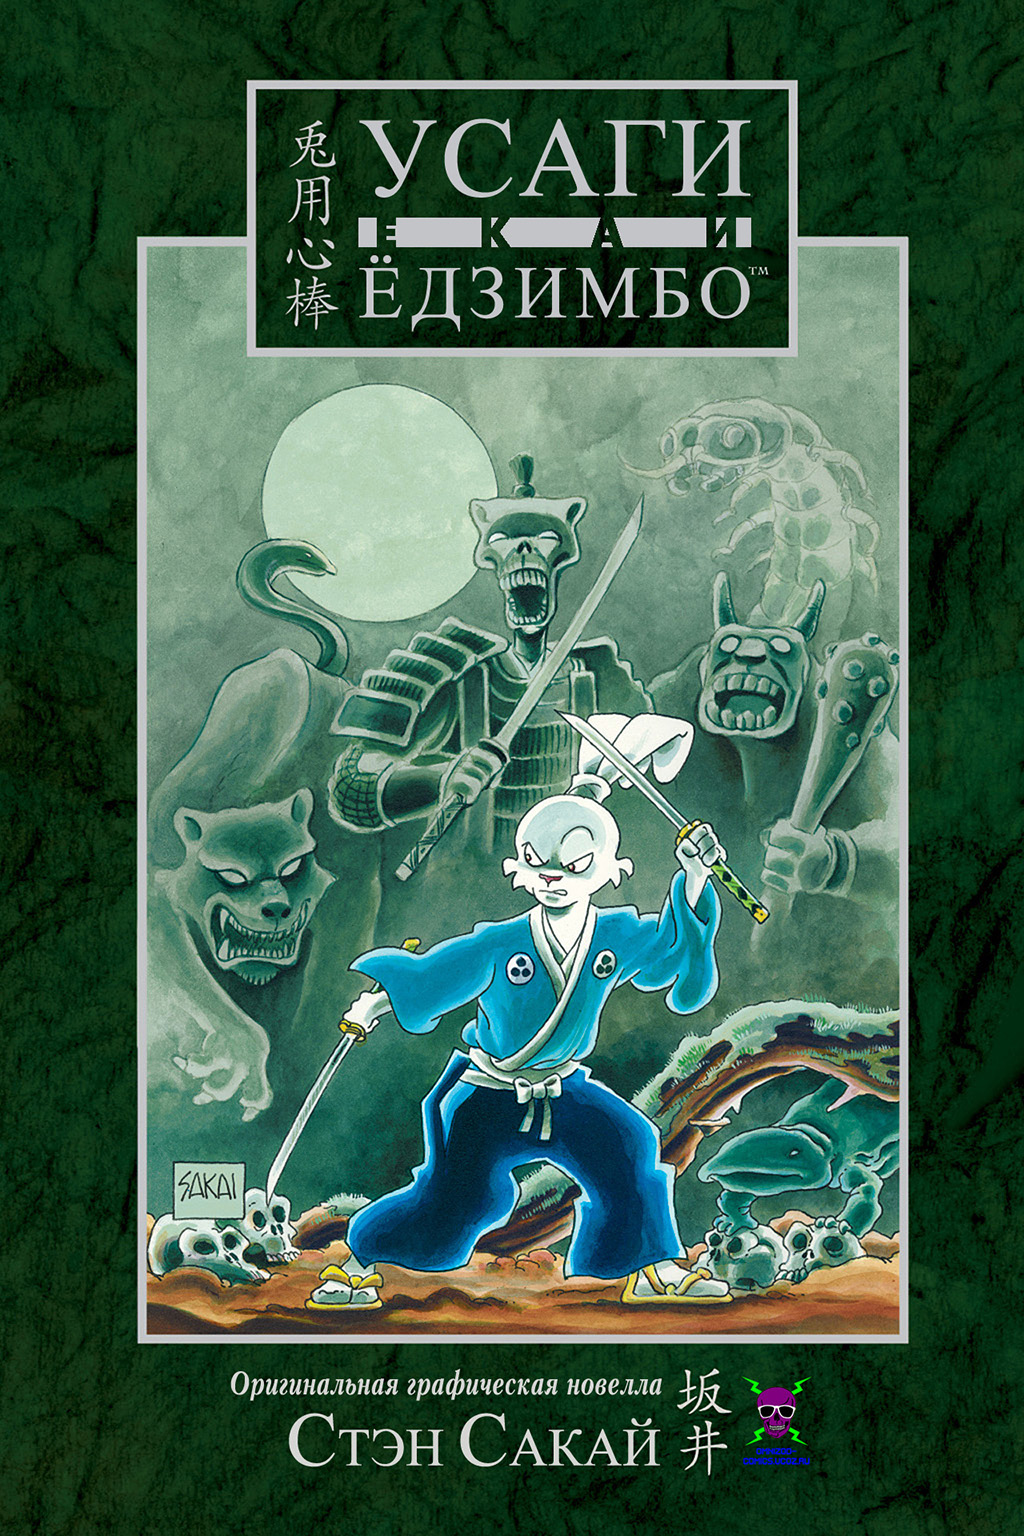 Комикс Усаги Ёдзимбо - Ёкай